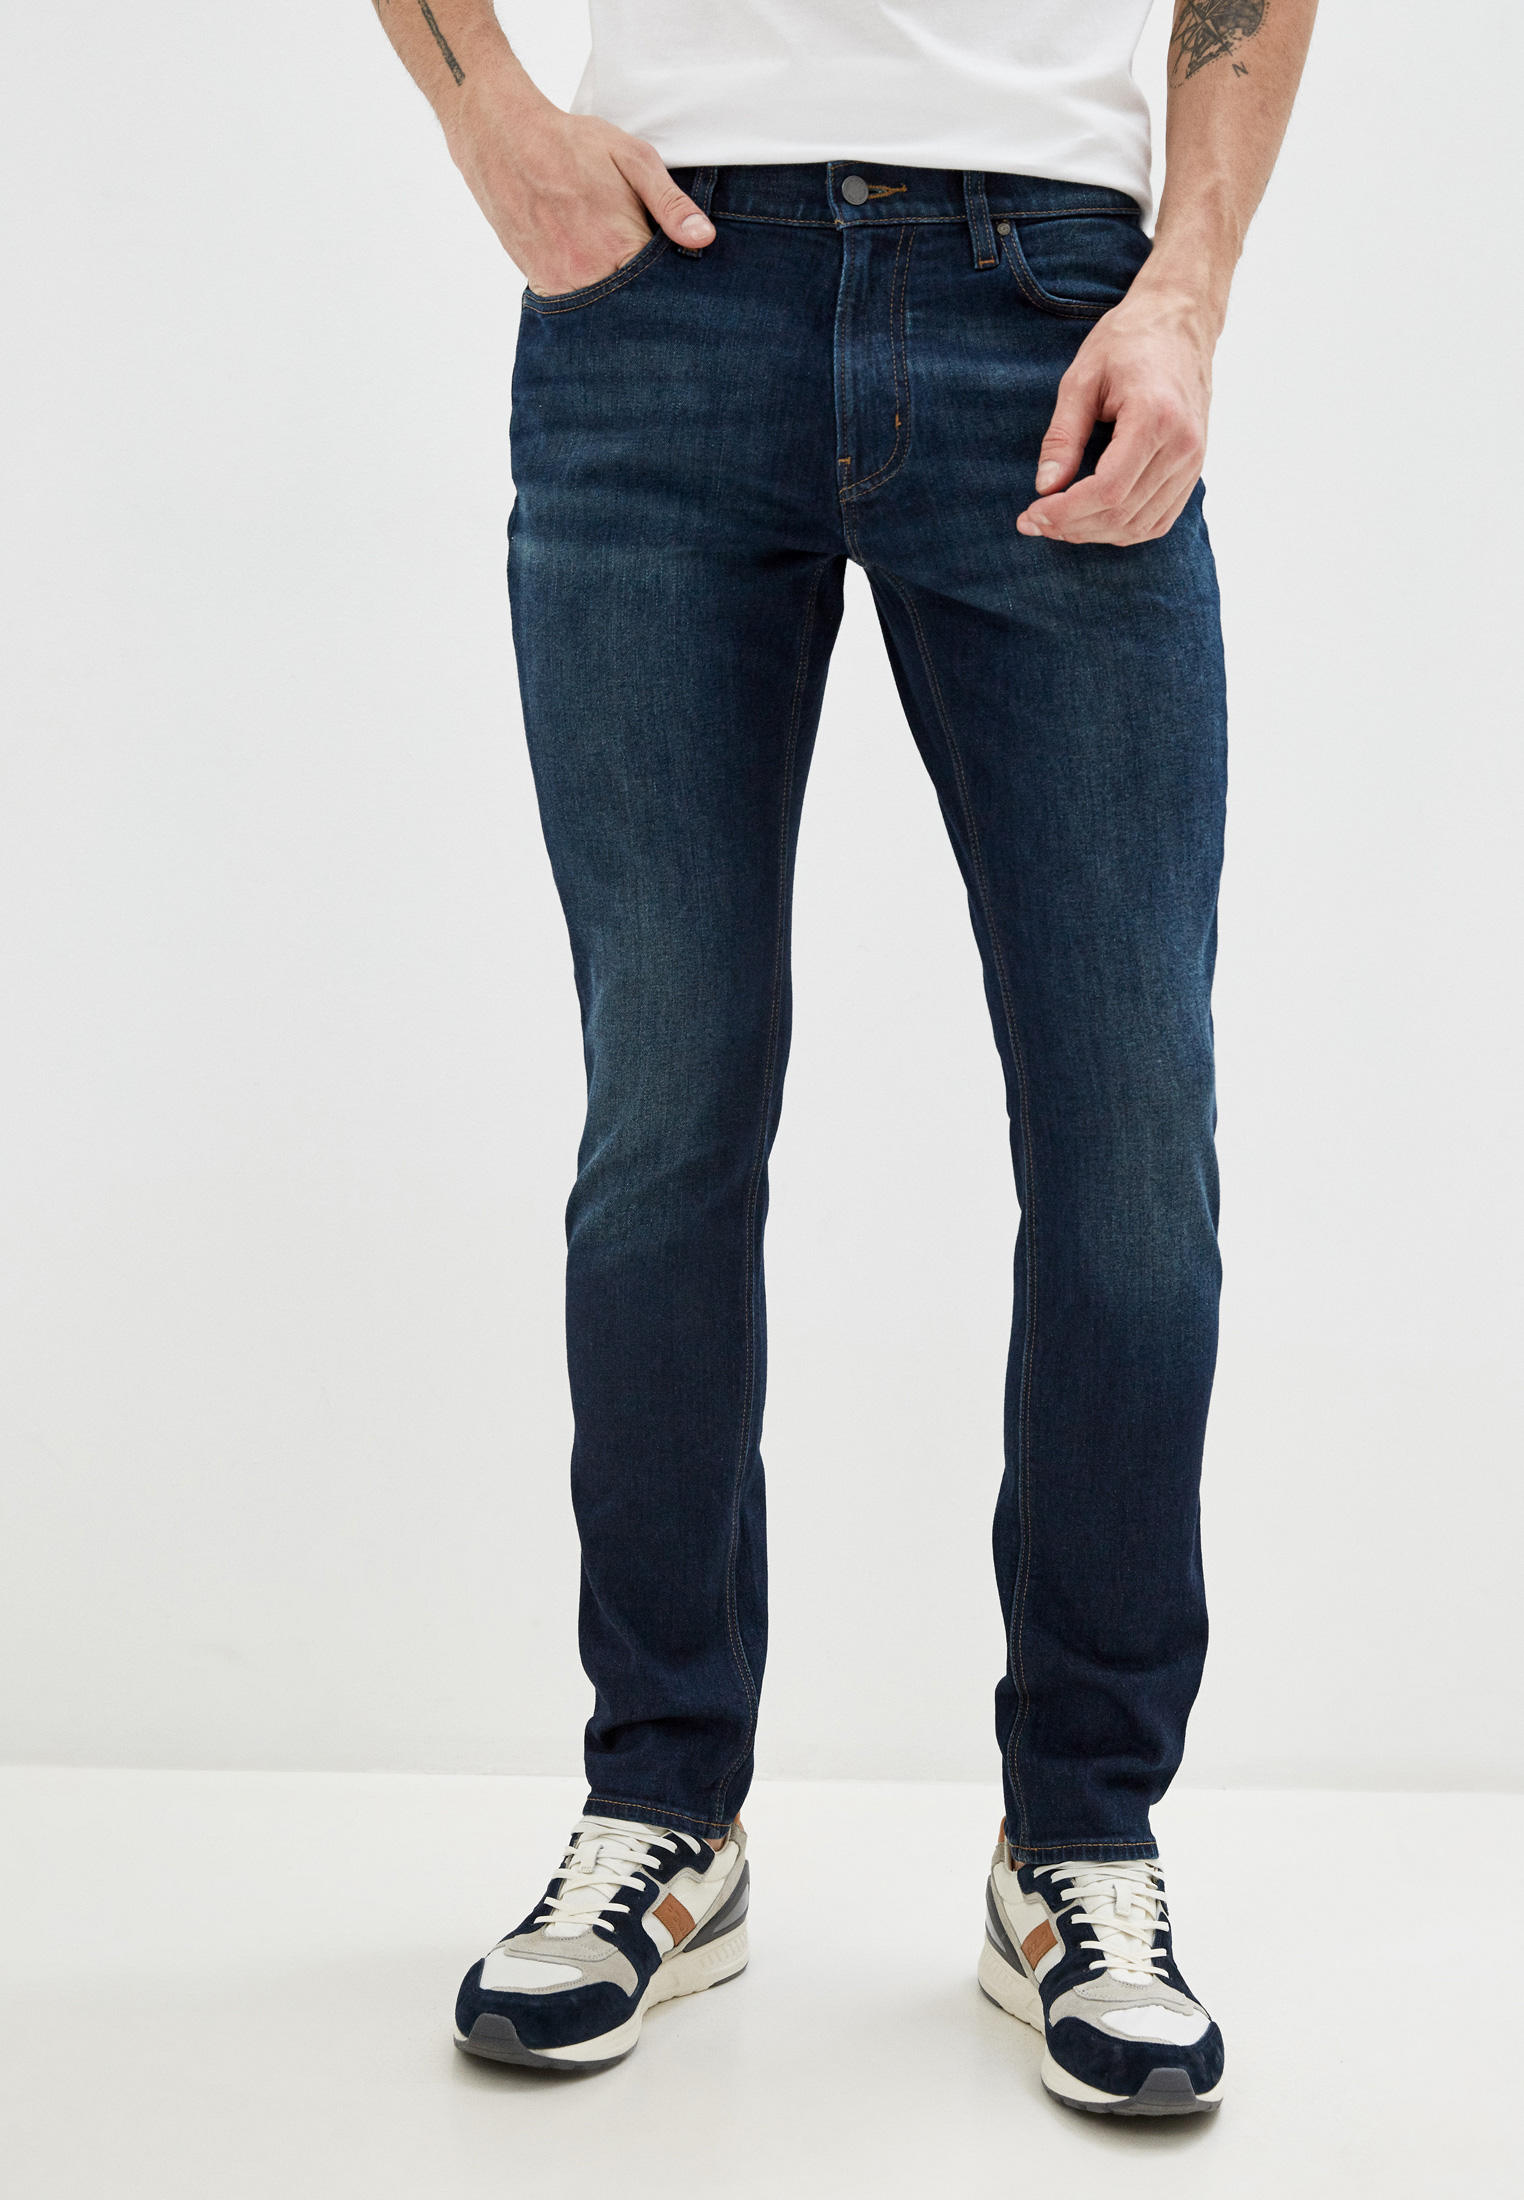 Зауженные джинсы Michael Kors CS99A5G7YH